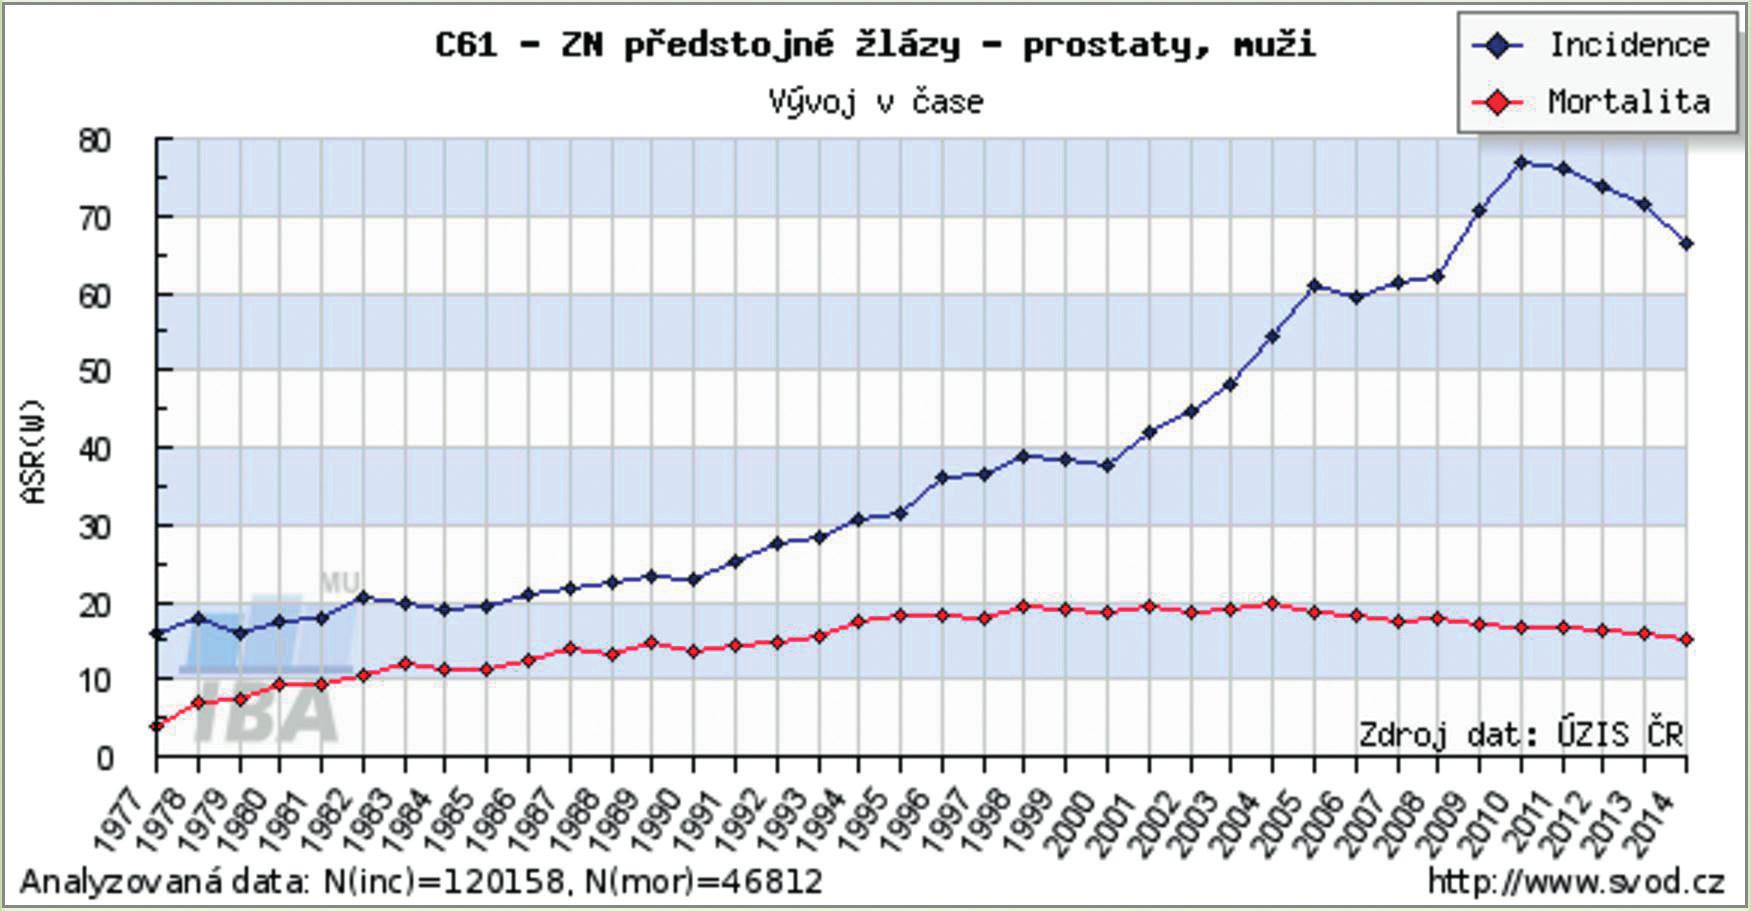 Vývoj karcinomu prostaty v čase - incidence a mortalita